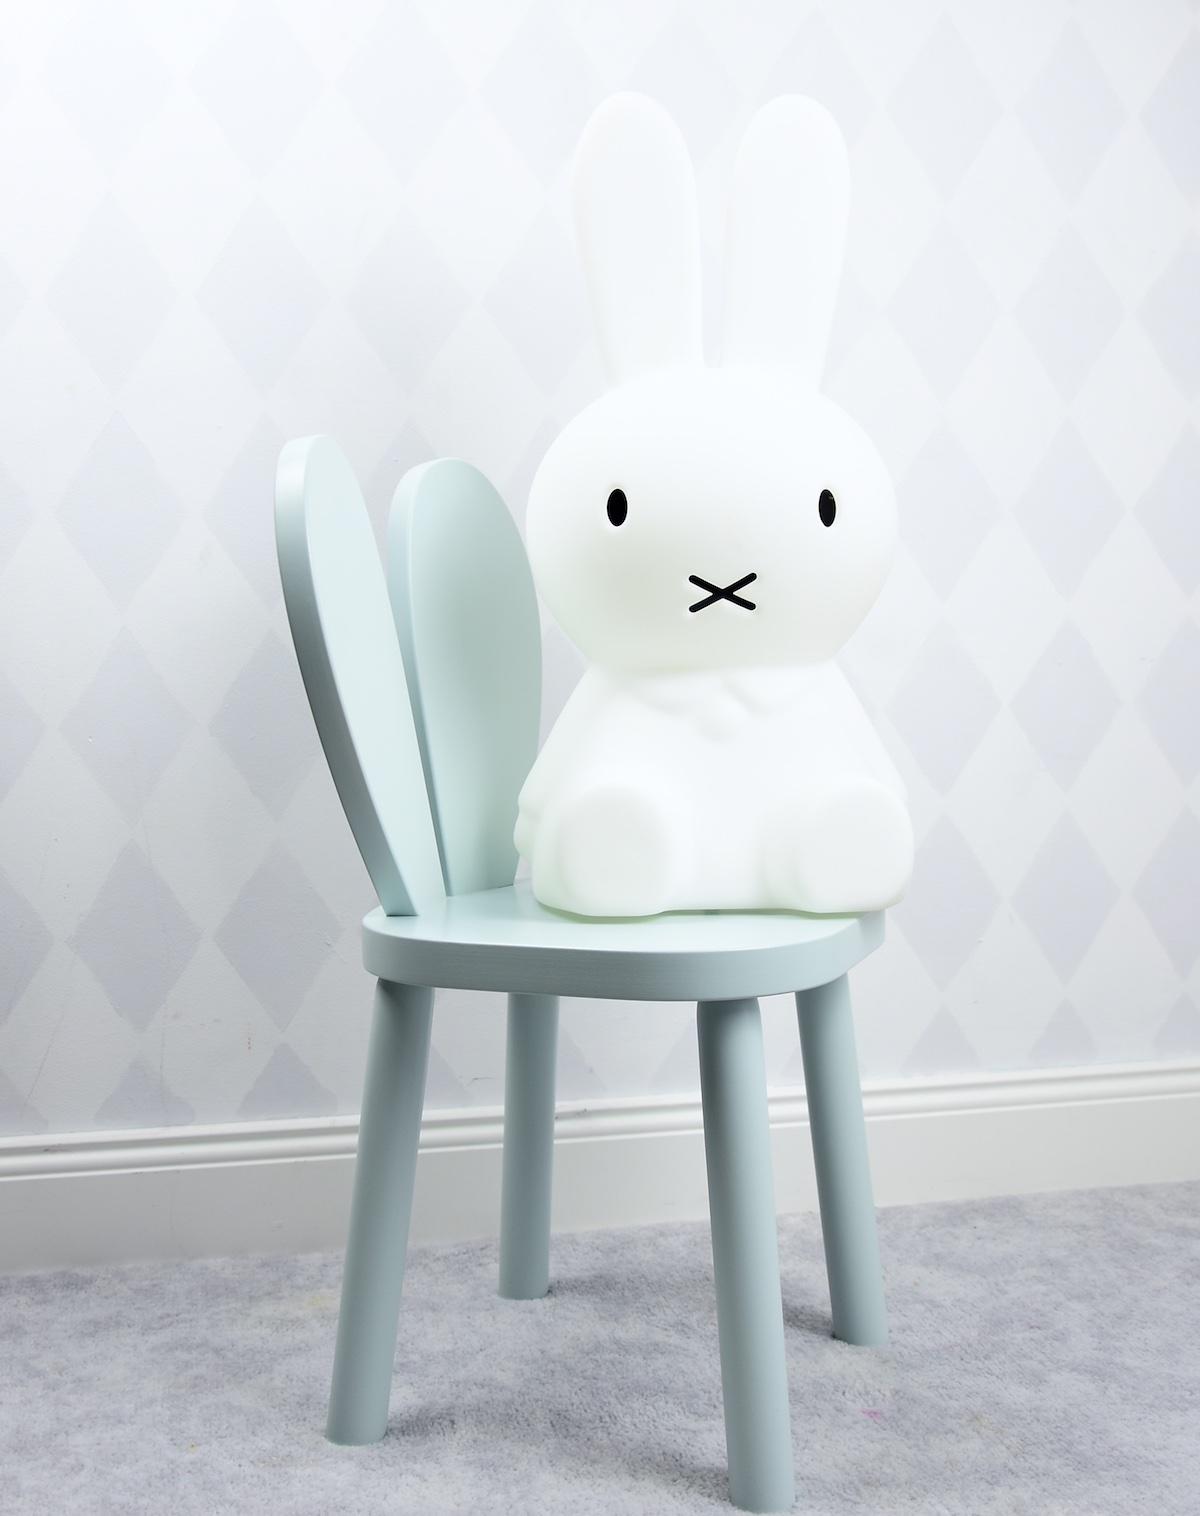 rabbit chair krzesełko drewniane krzesło królik króliczek mięta heart serce